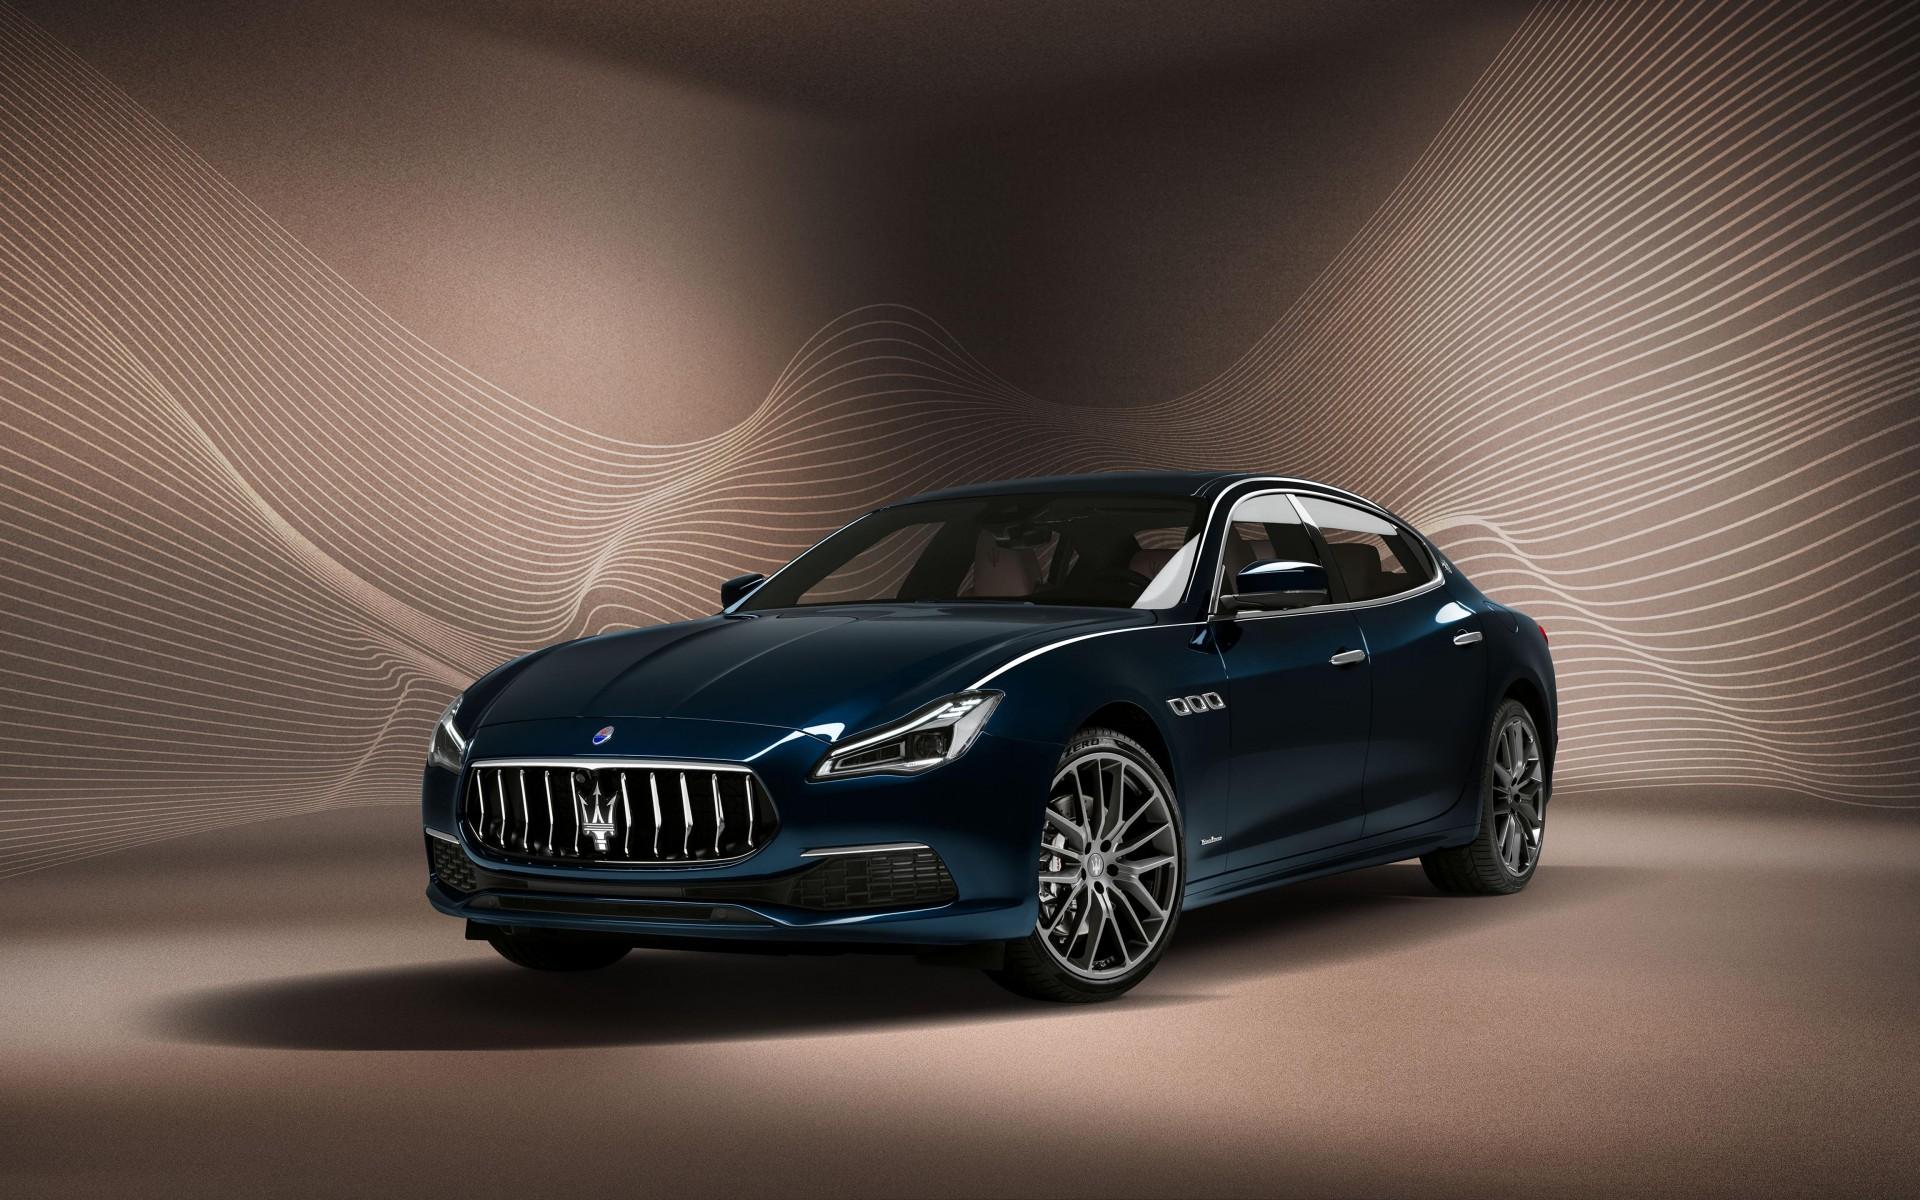 Maserati Quattroporte GranLusso Royale 2020 5K HD desktop 1920x1200